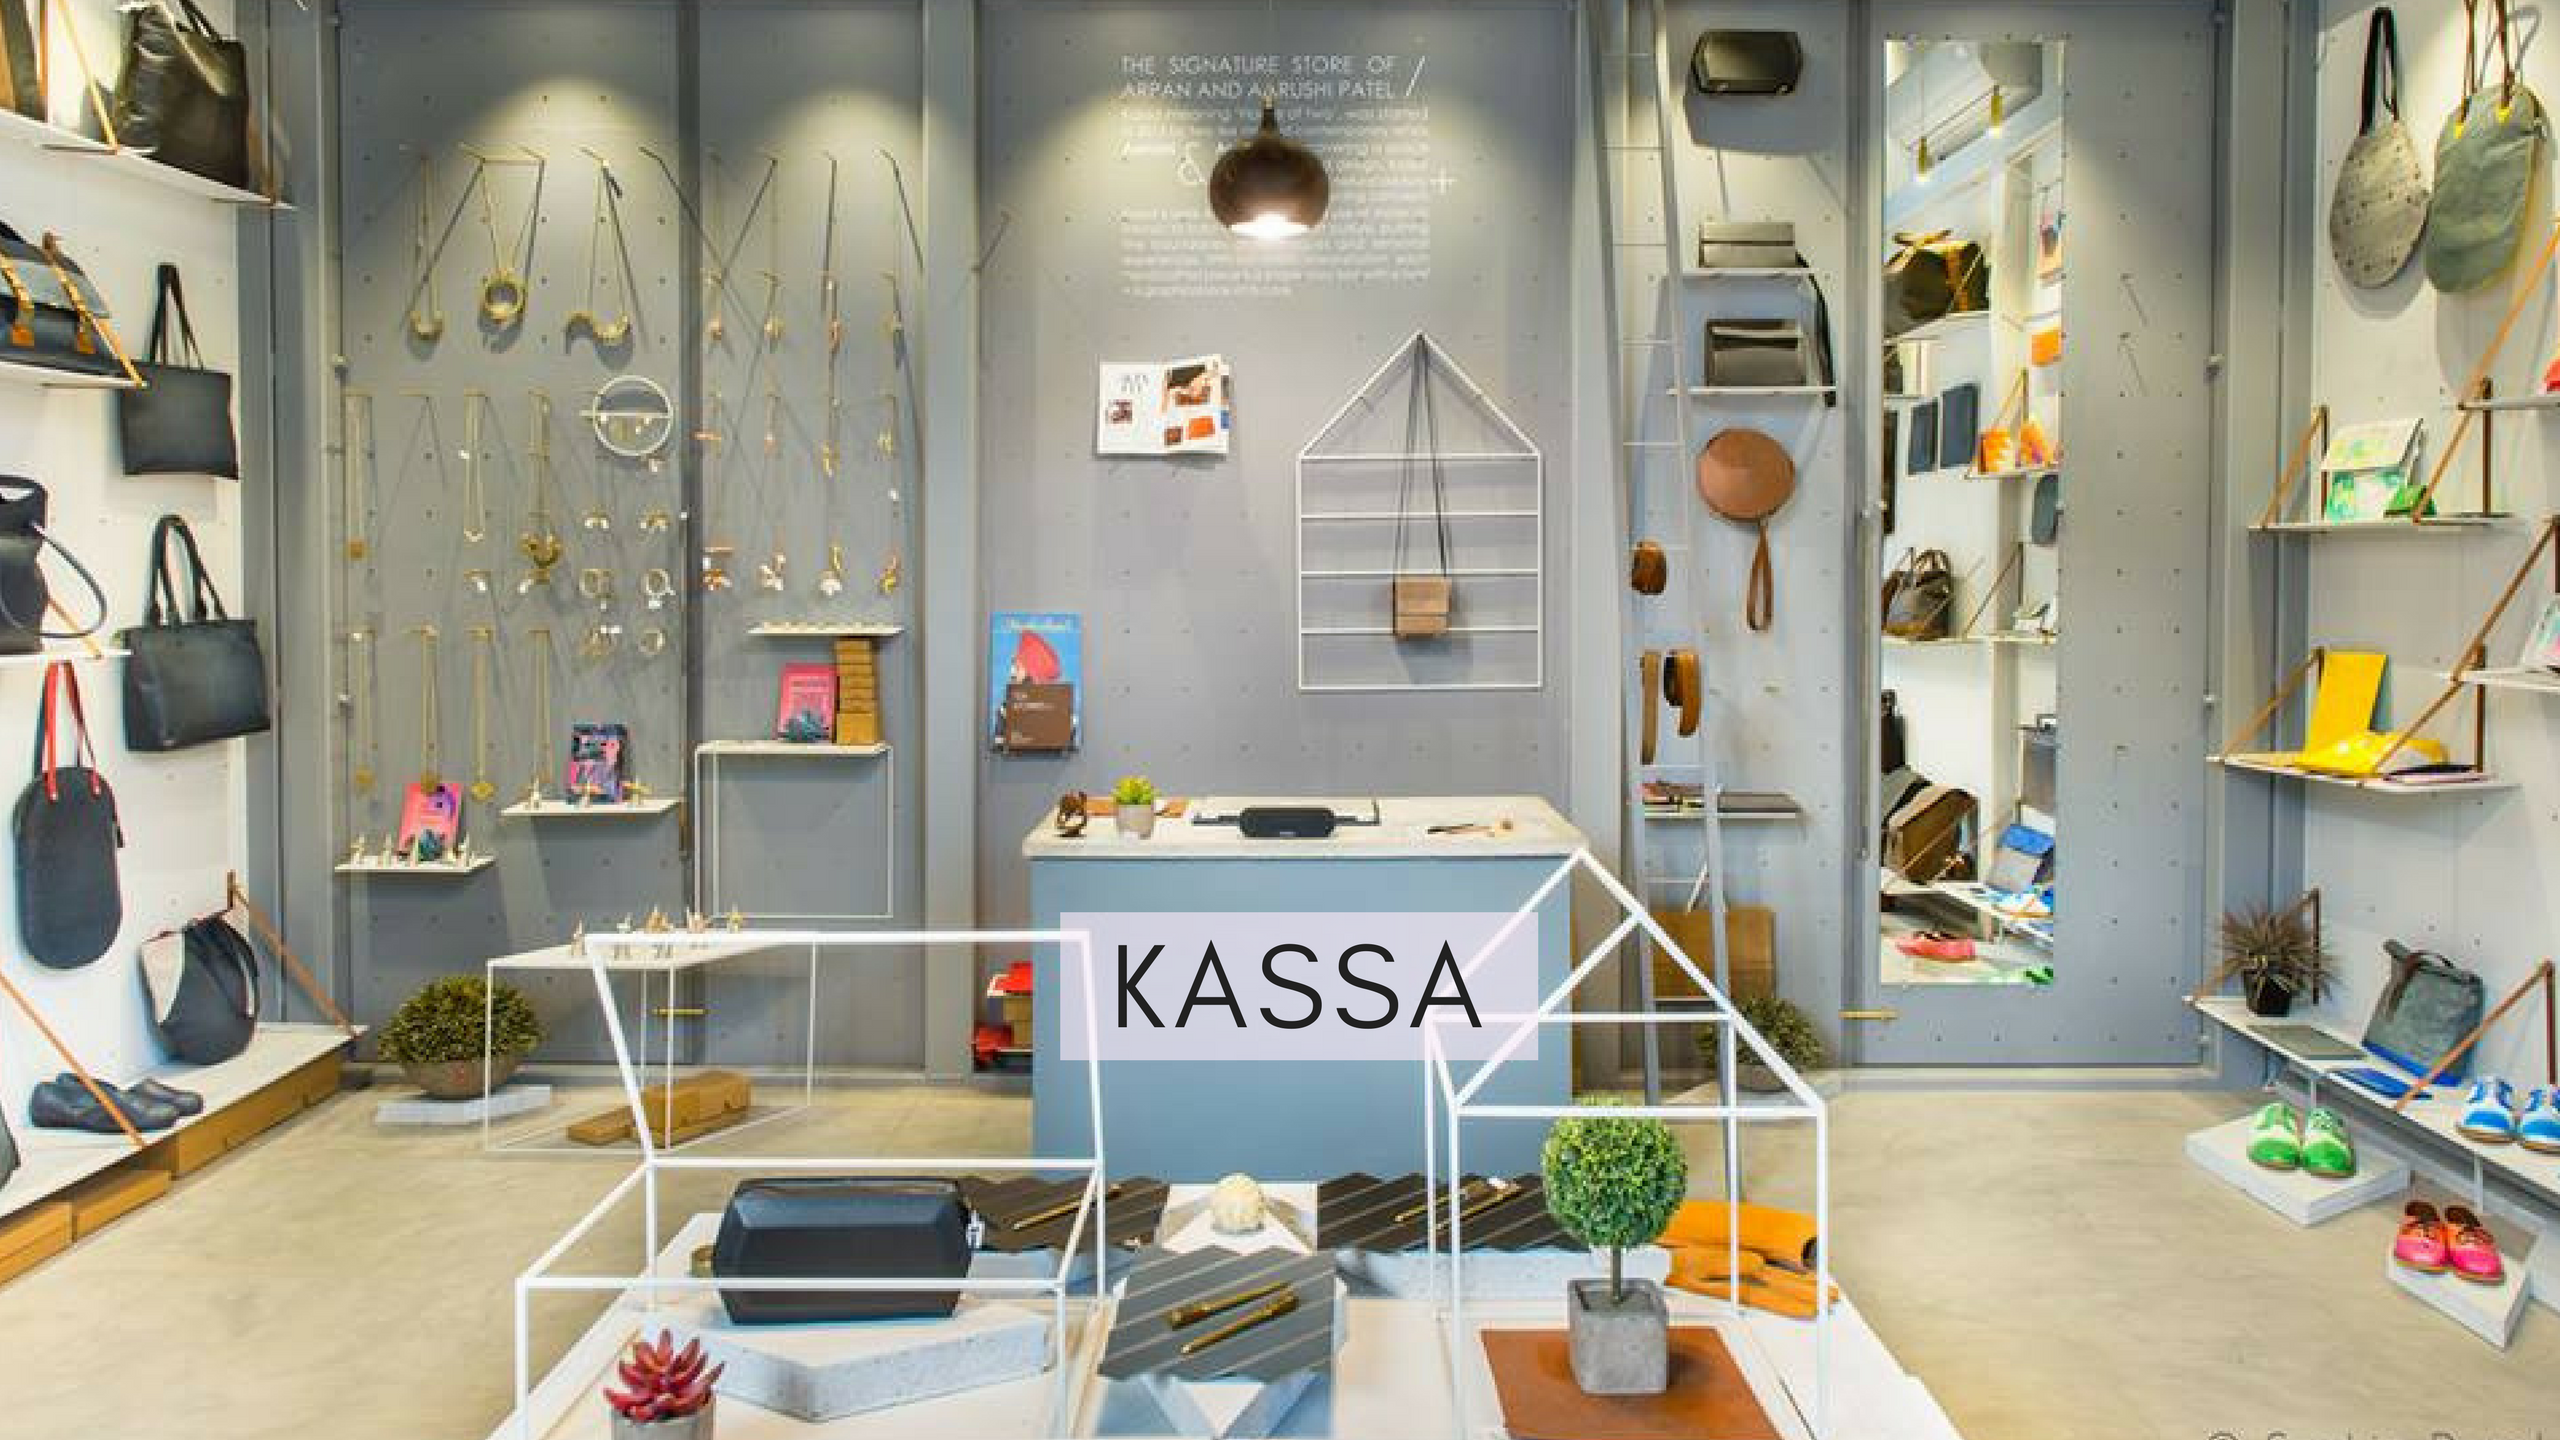 STUDIO KASSA- The Designer Home For Handcrafted Luxury In Jaipur